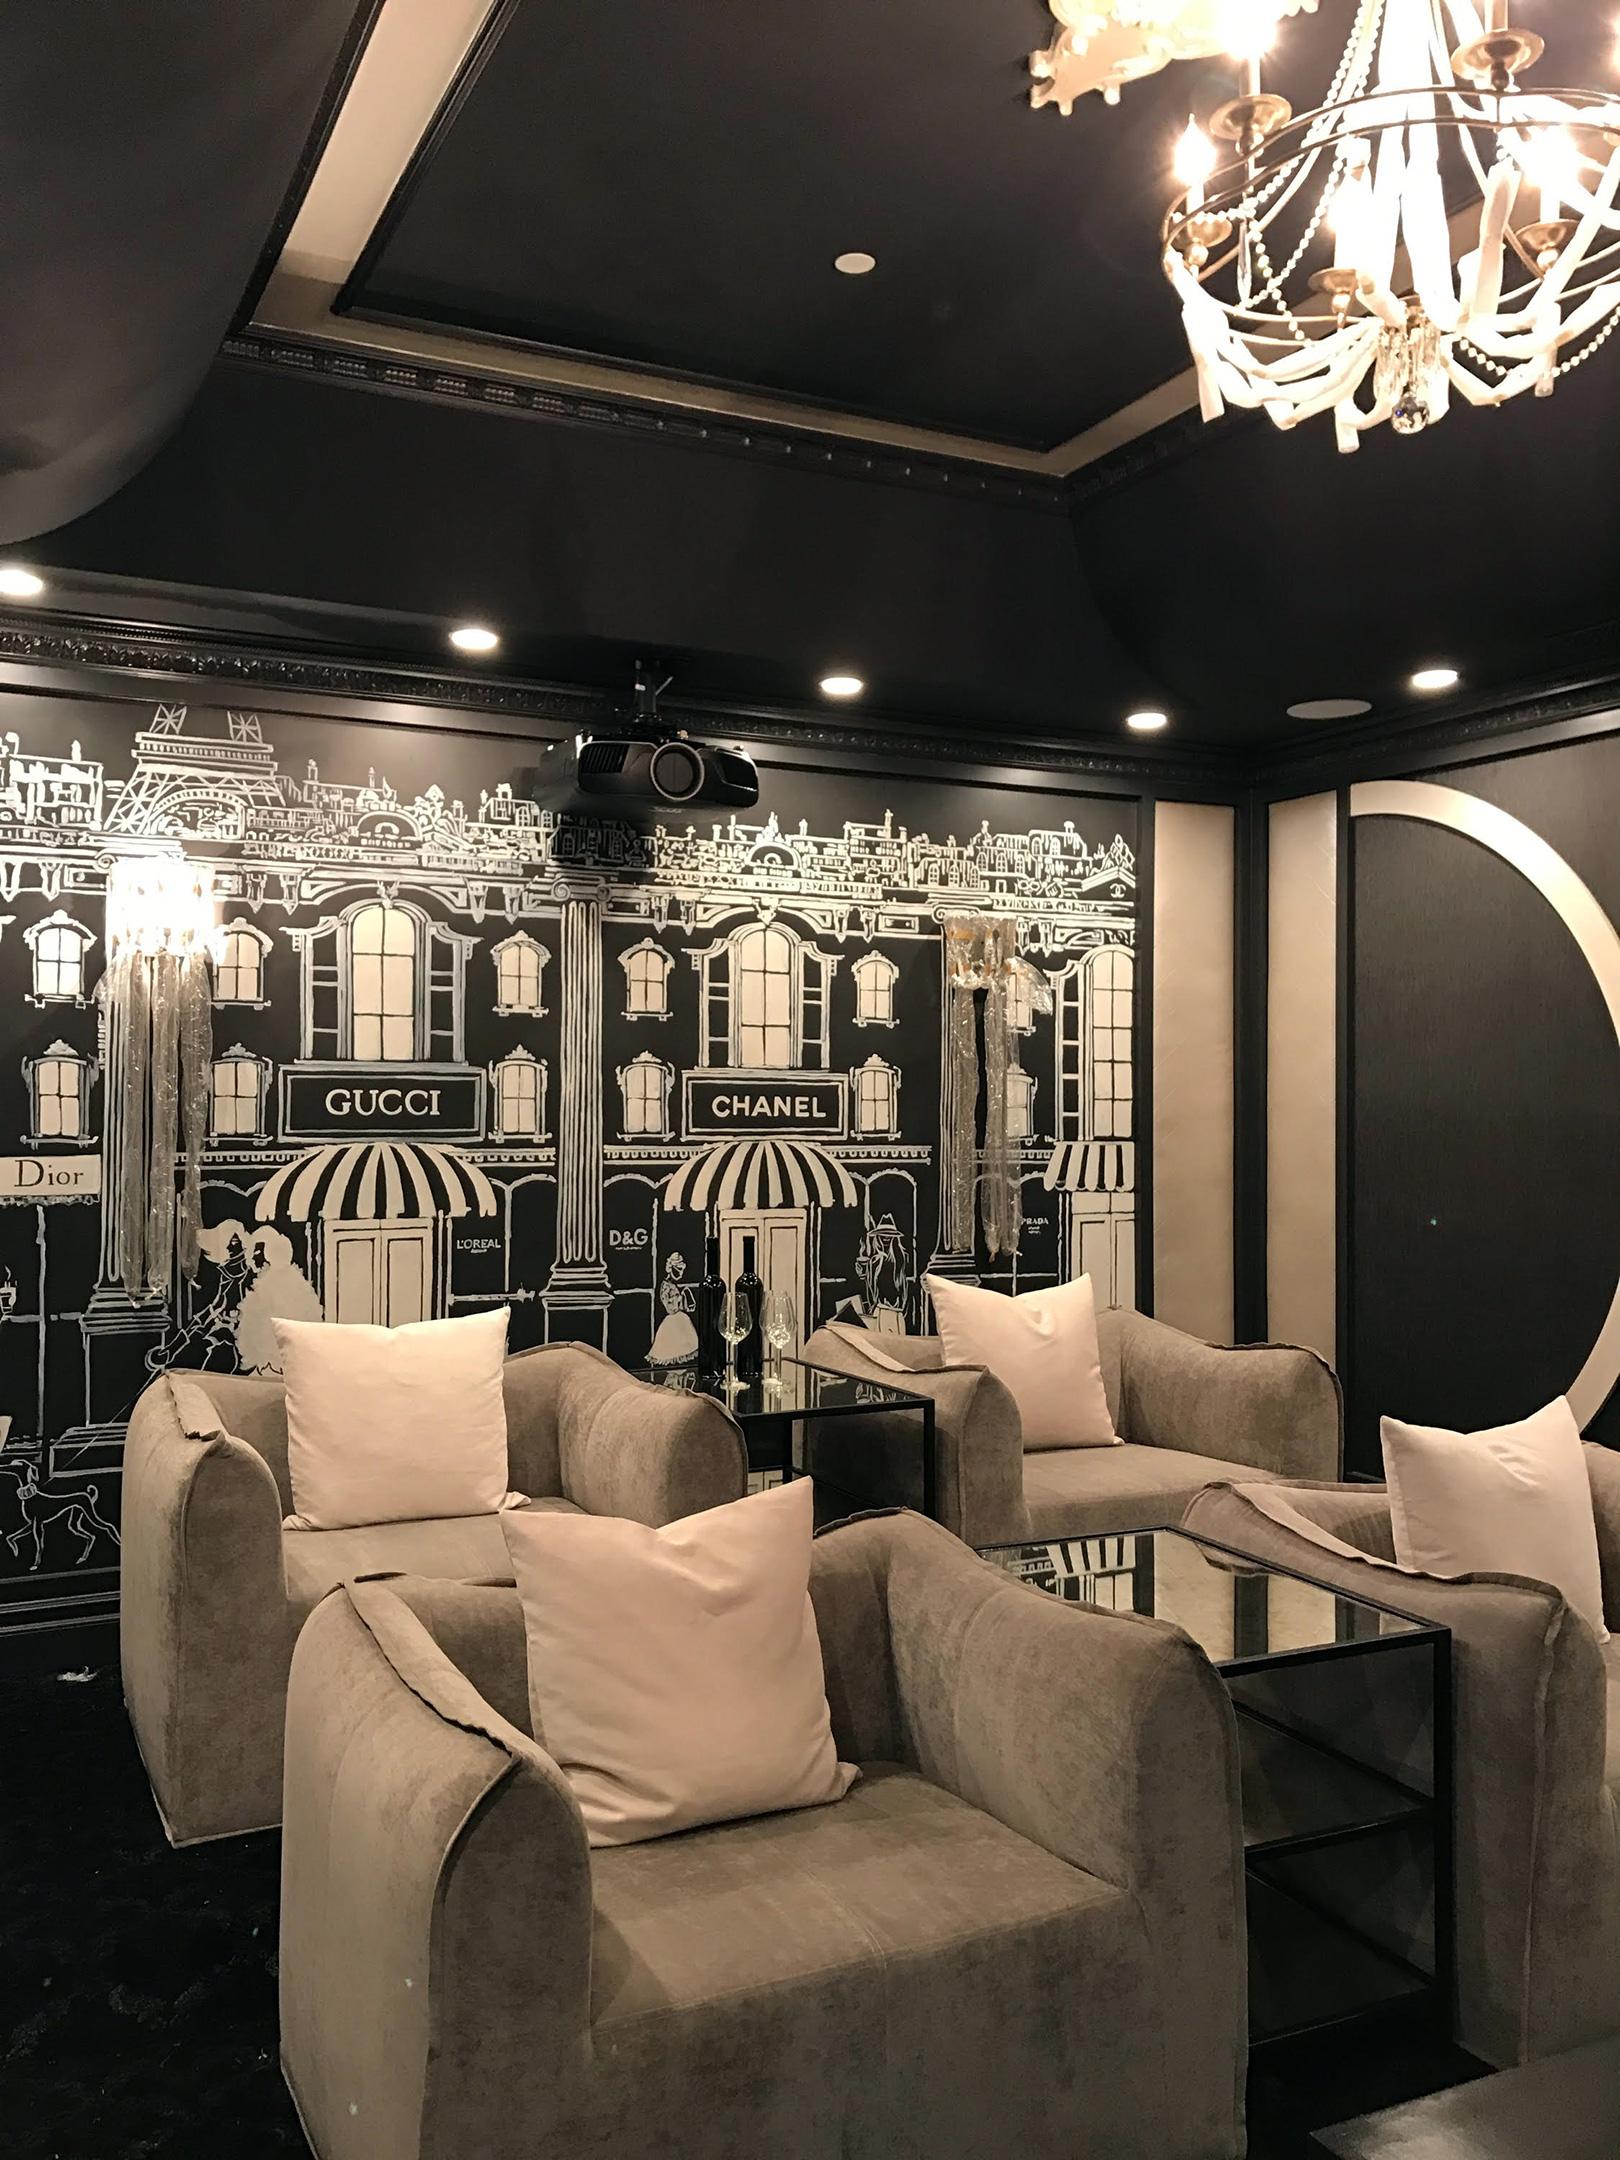 Chanel Home Cinema